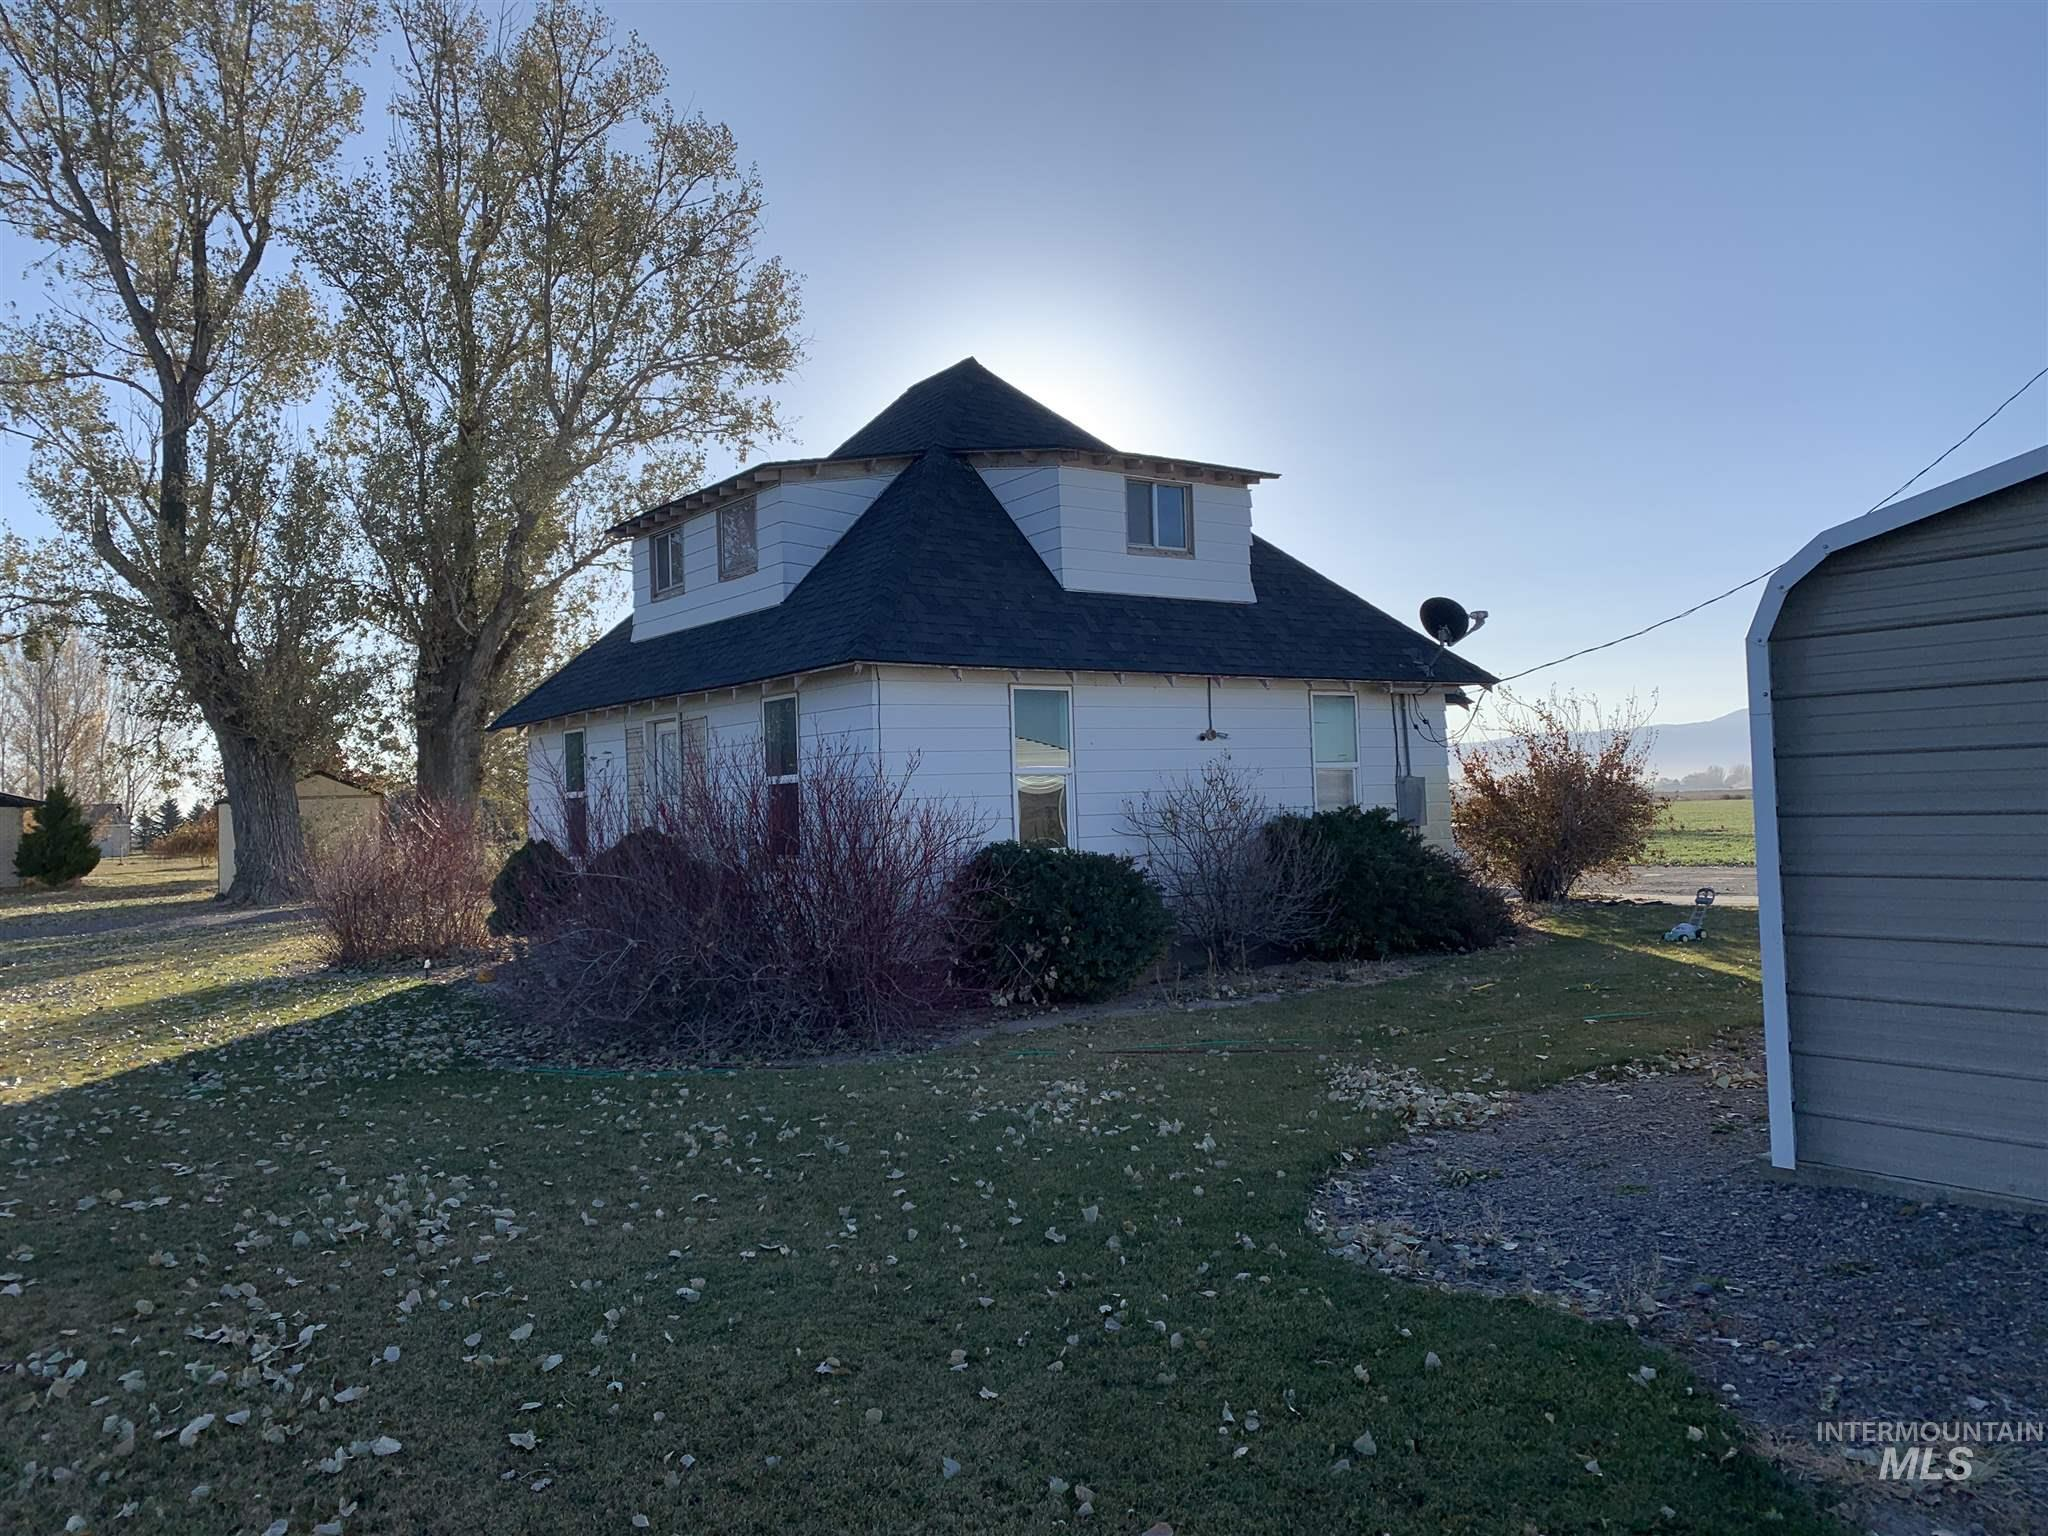 903 W 300 S Property Photo - Heyburn, ID real estate listing